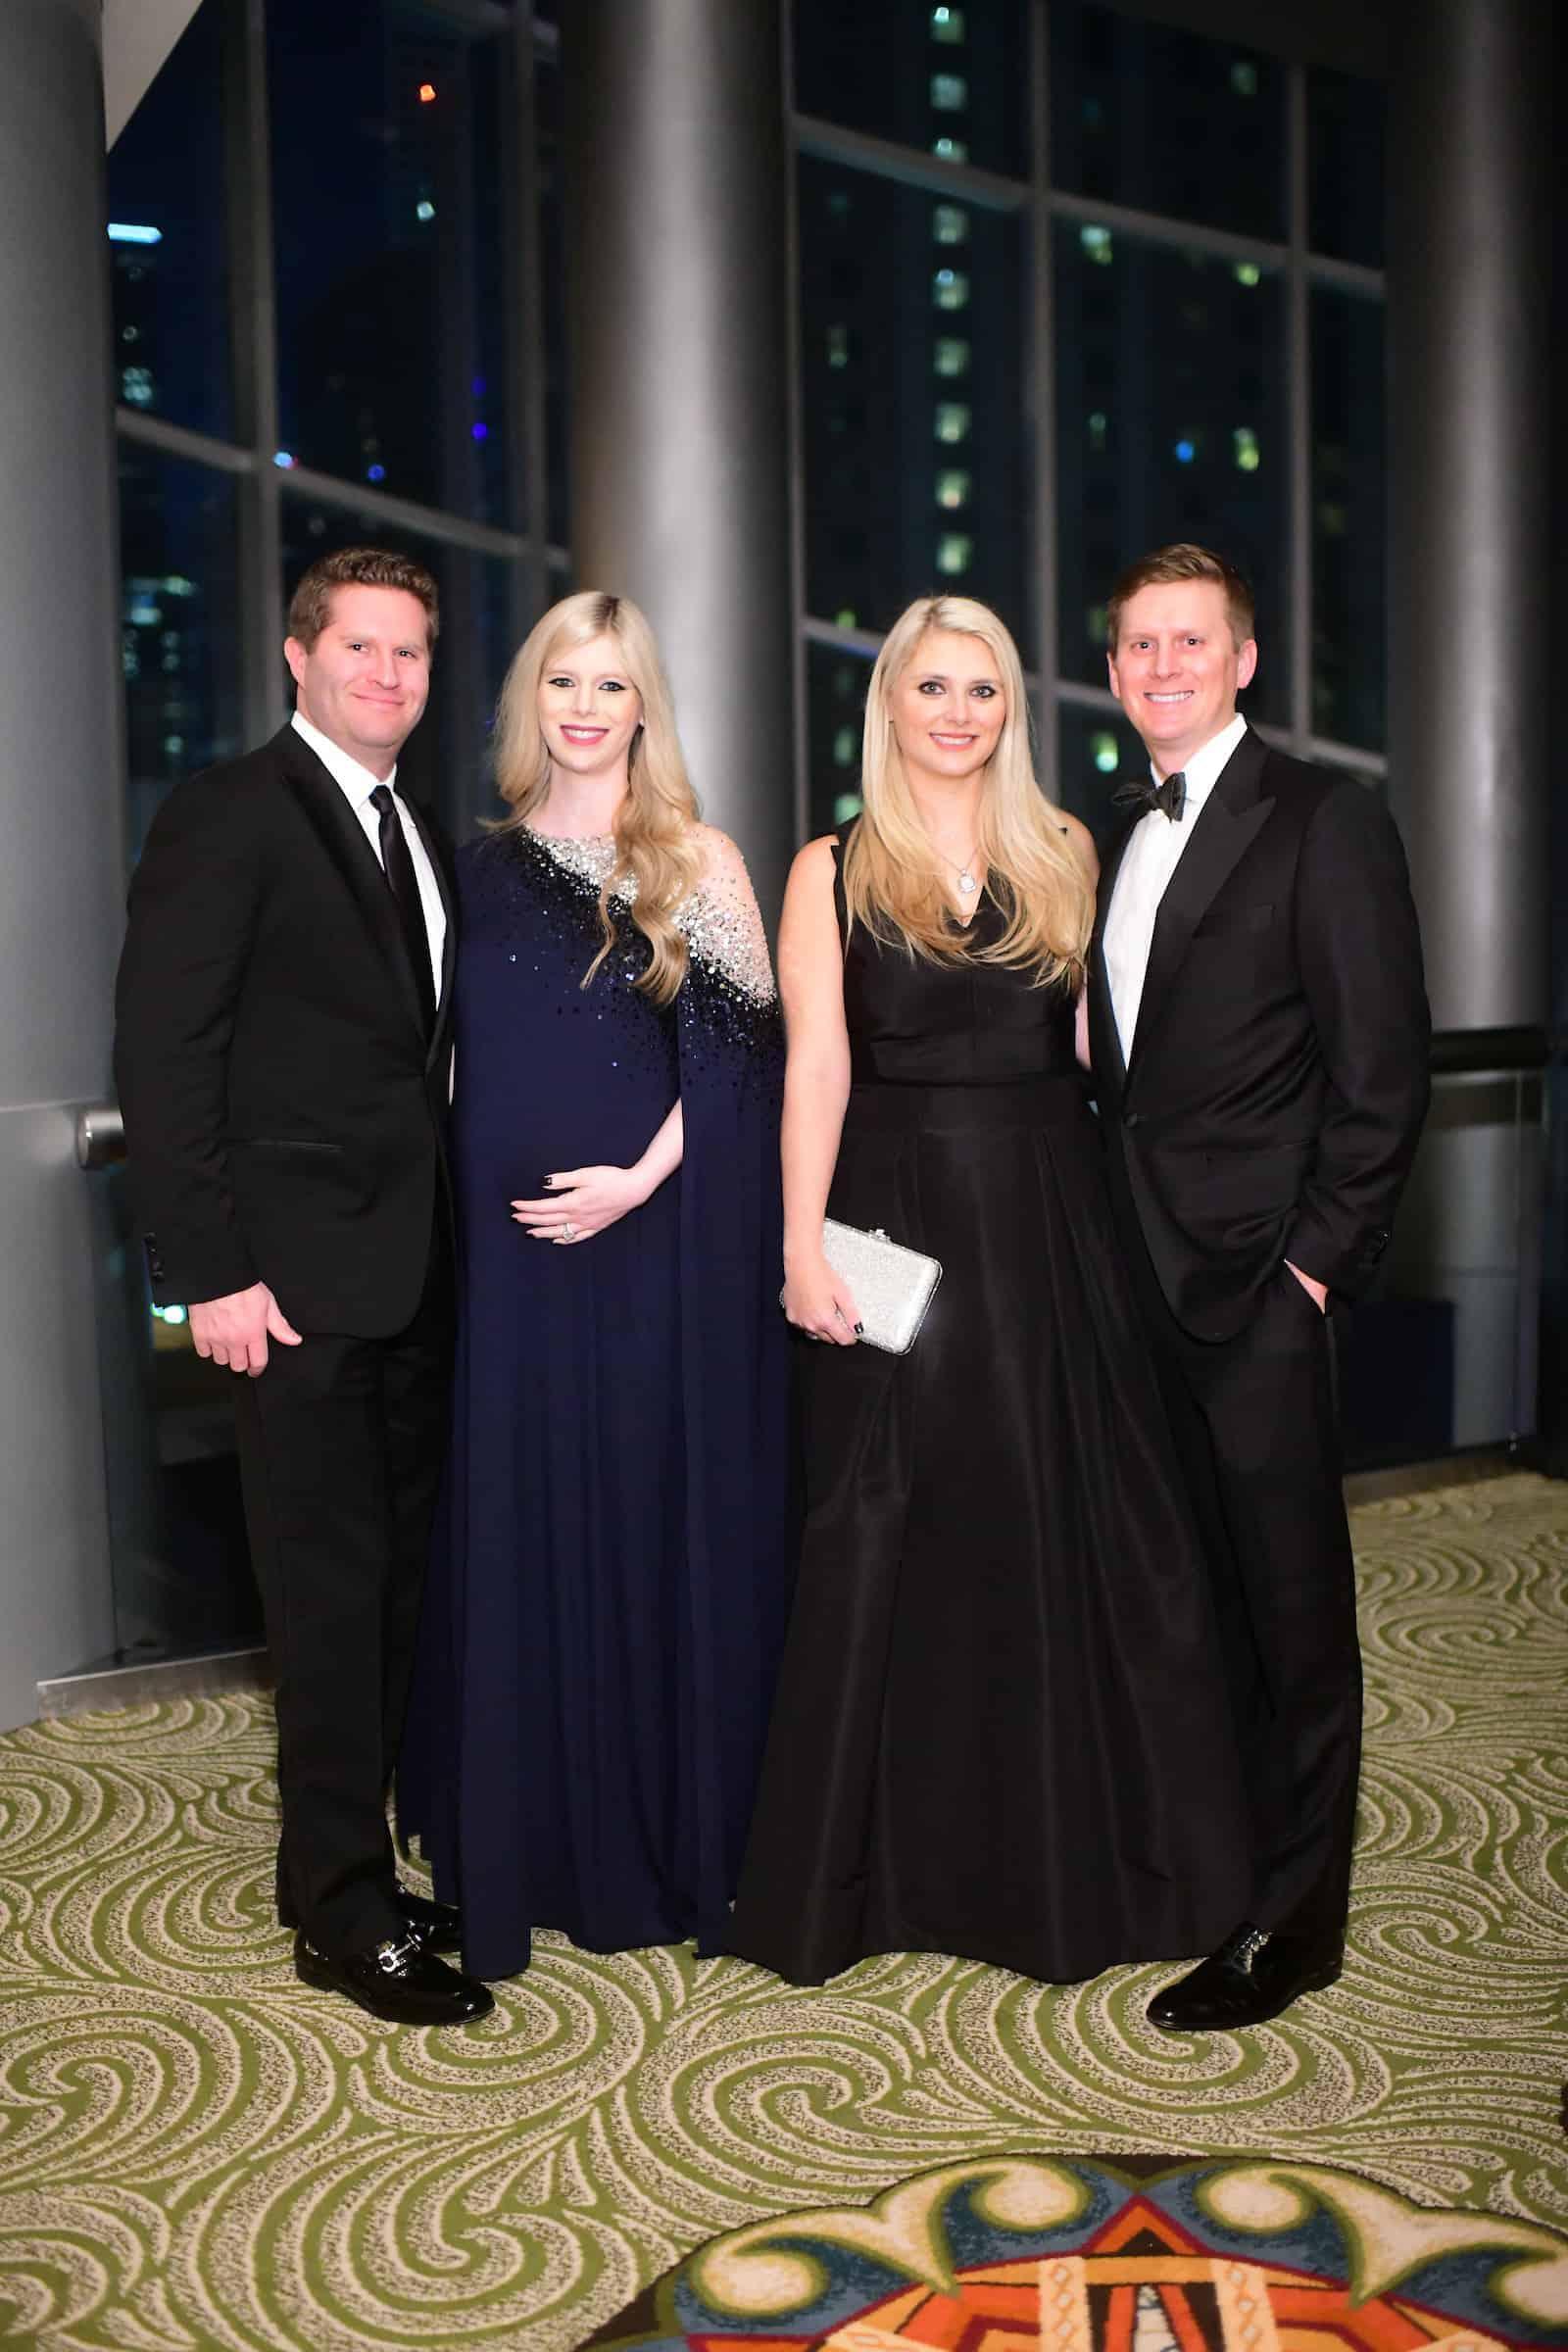 Evan and Kimberly Scheele & Christine and Bill Gutknecht